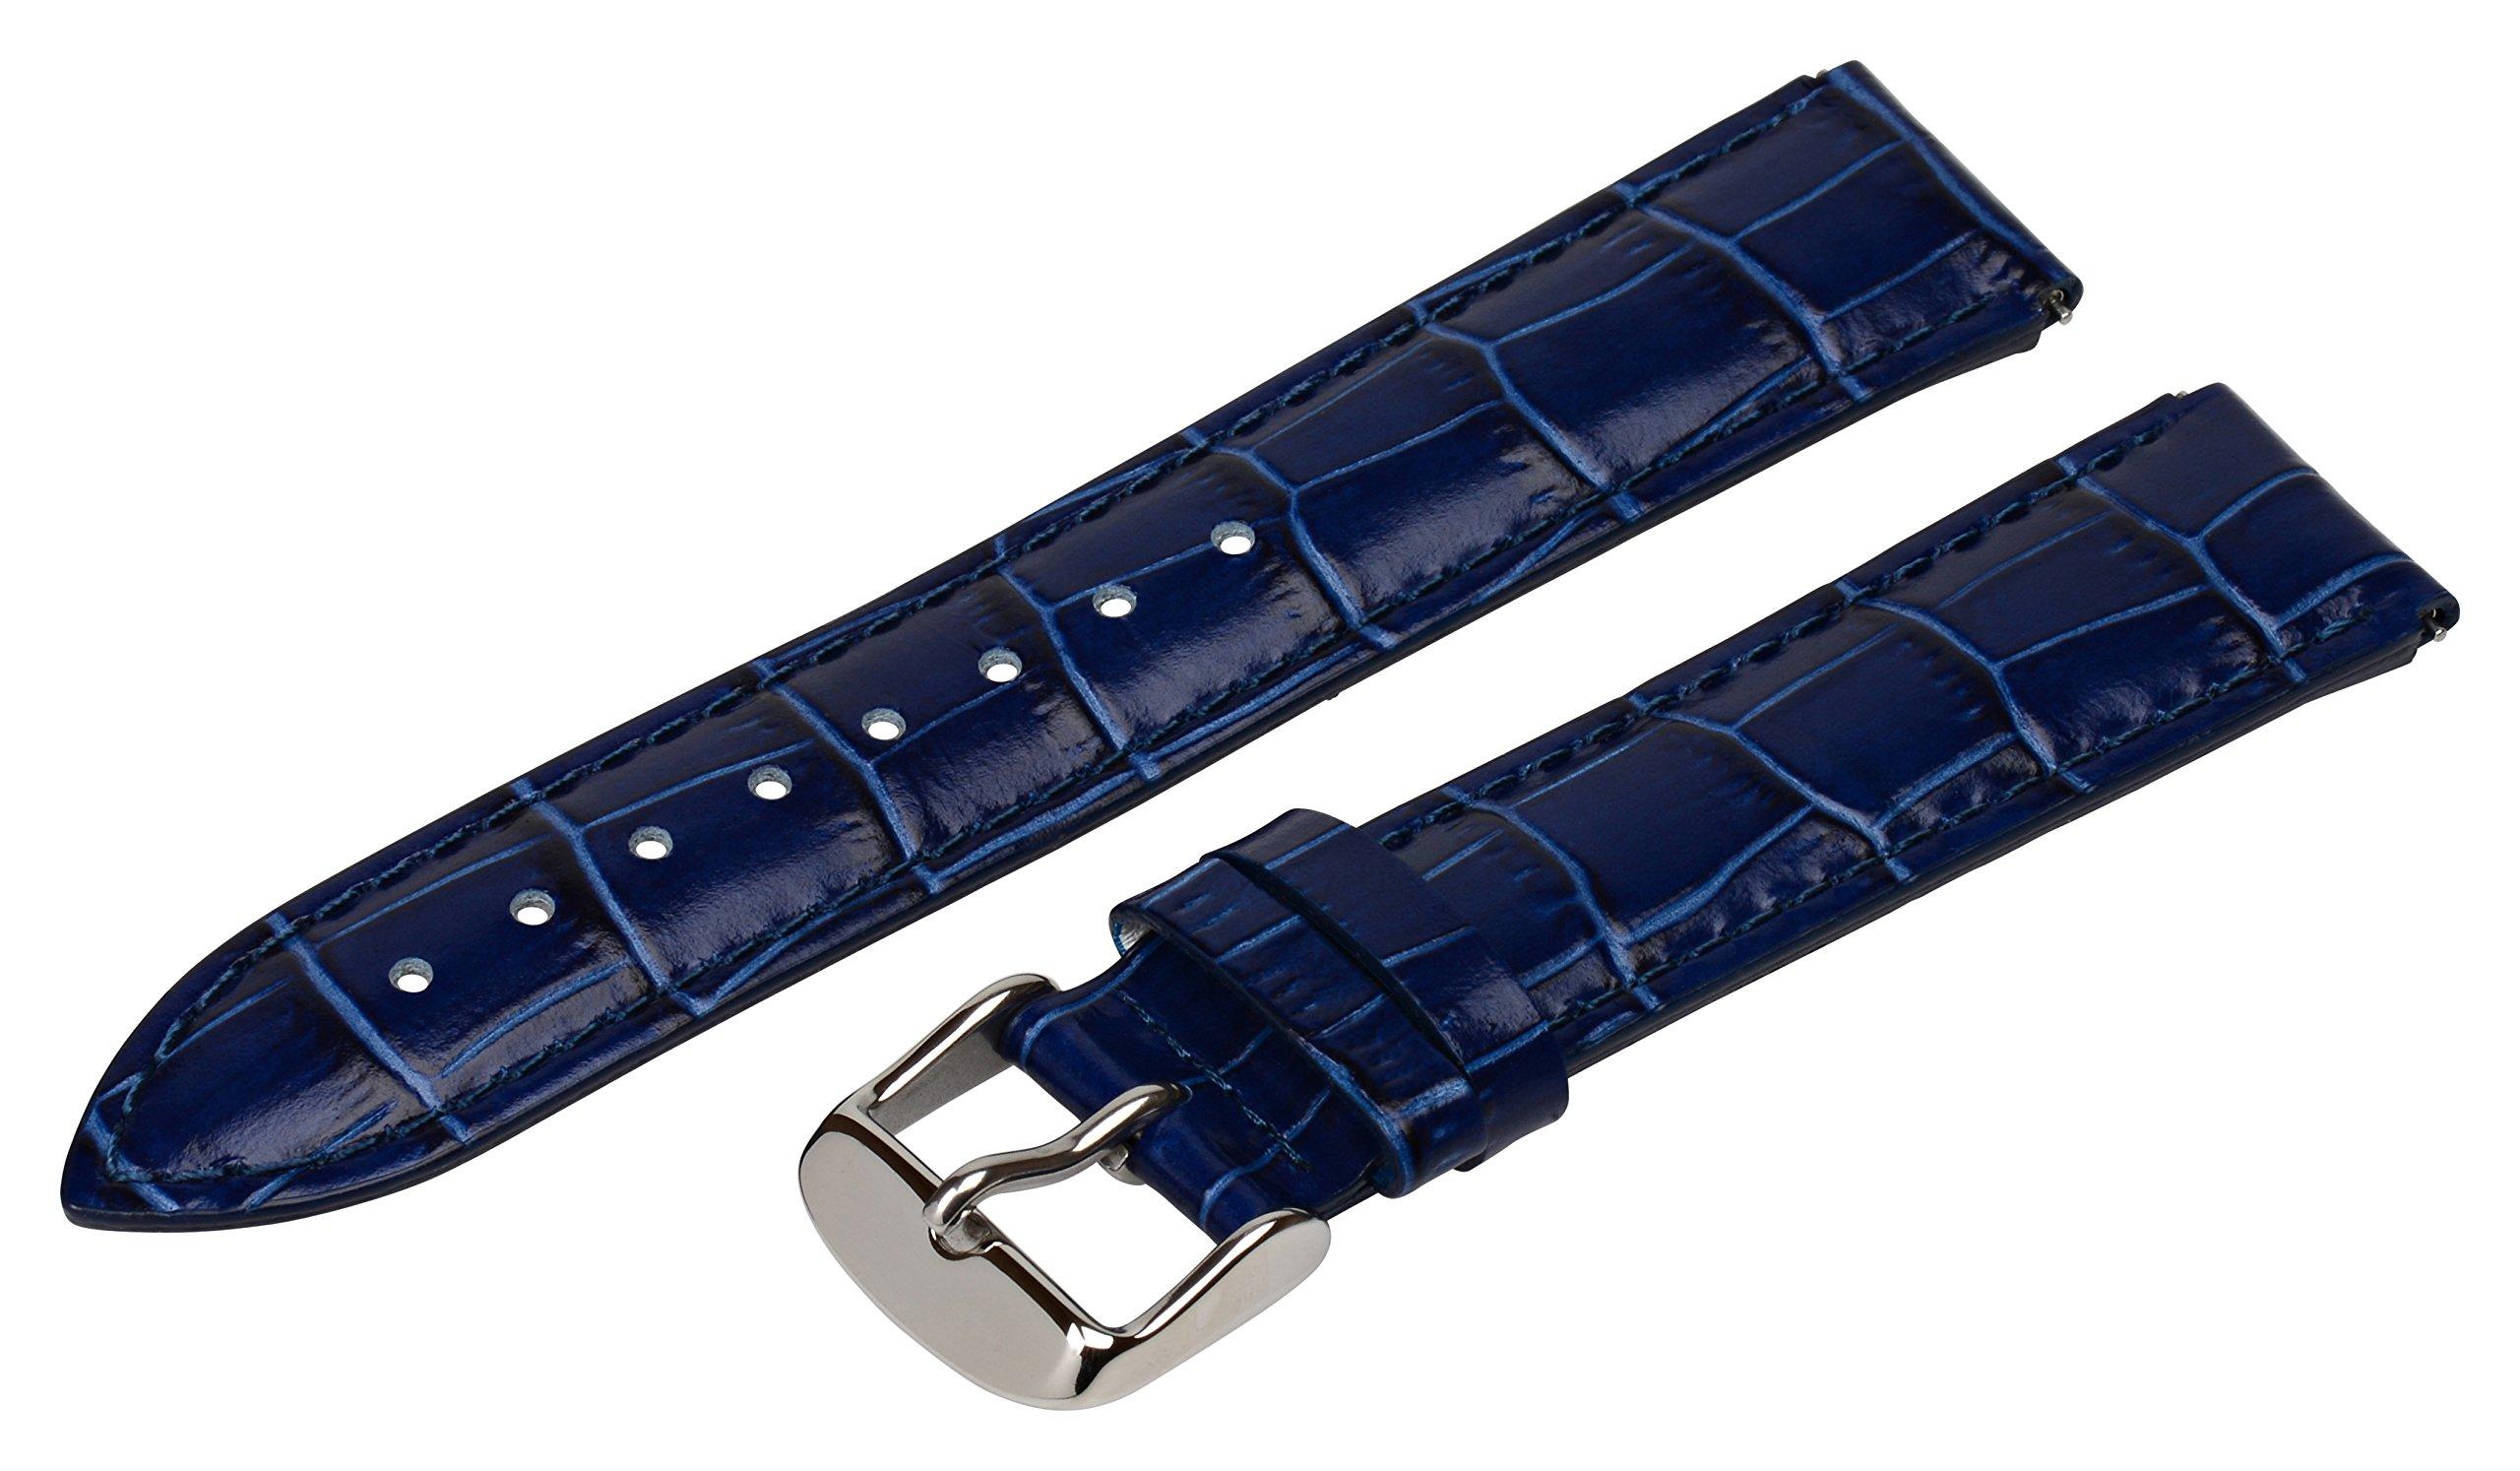 Clockwork Synergy® - 12mm x 10mm - Navy Croco Grain Leather Watch Band fits Philip stein Mini